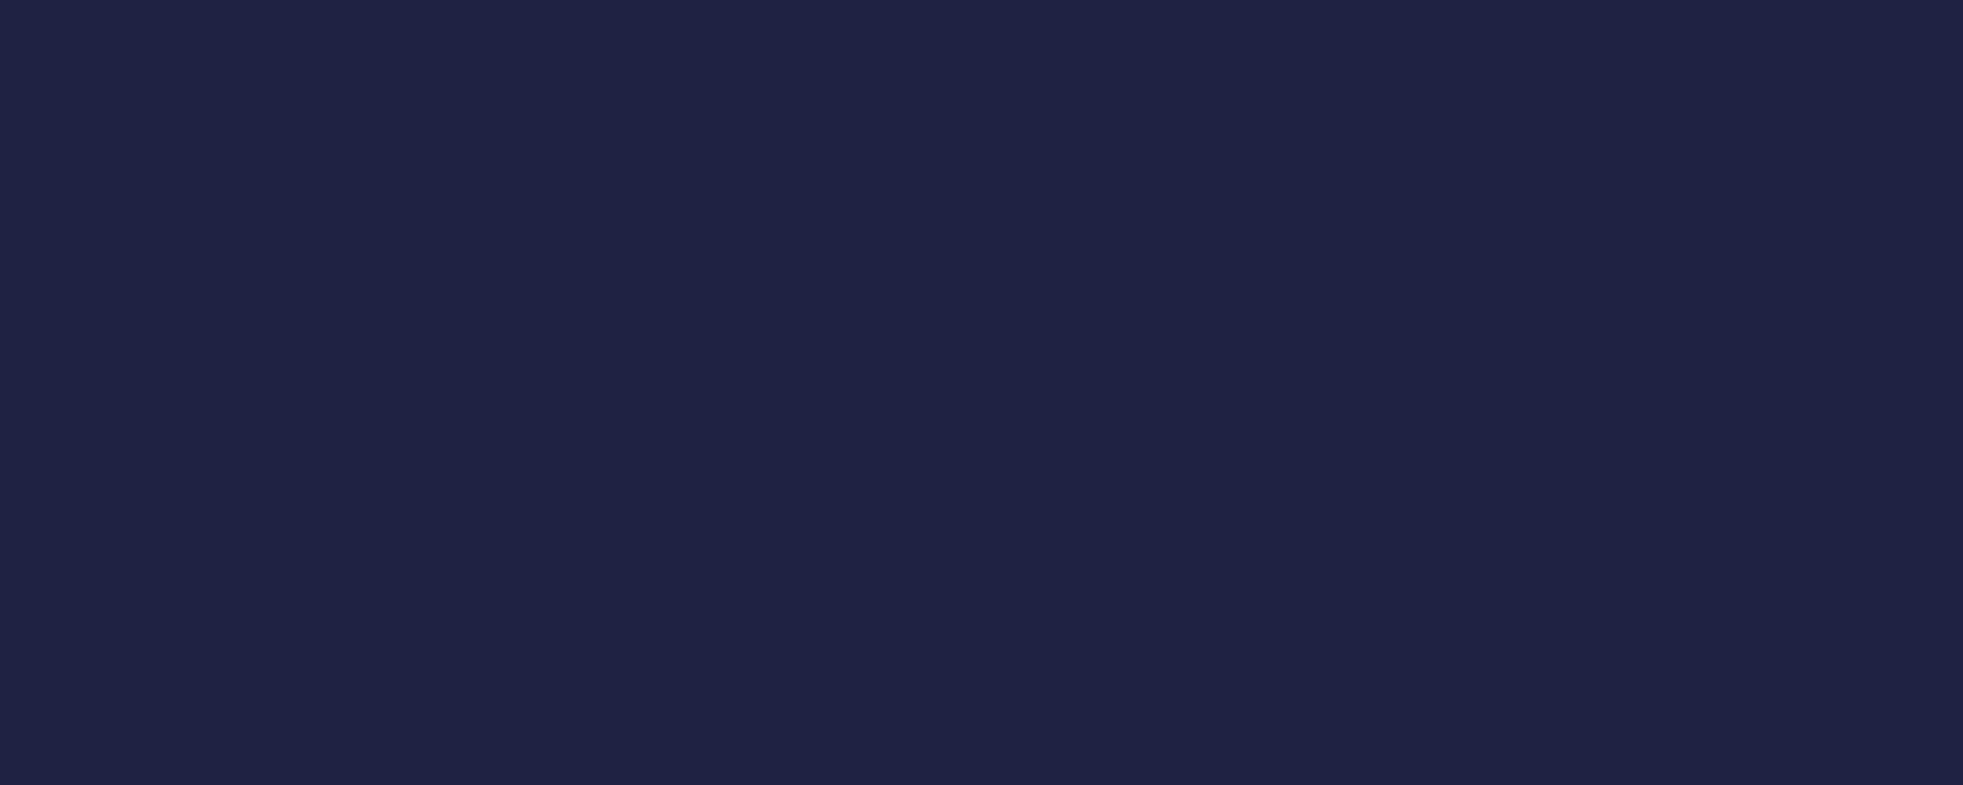 Image description: Digits & Threads logo image, navy